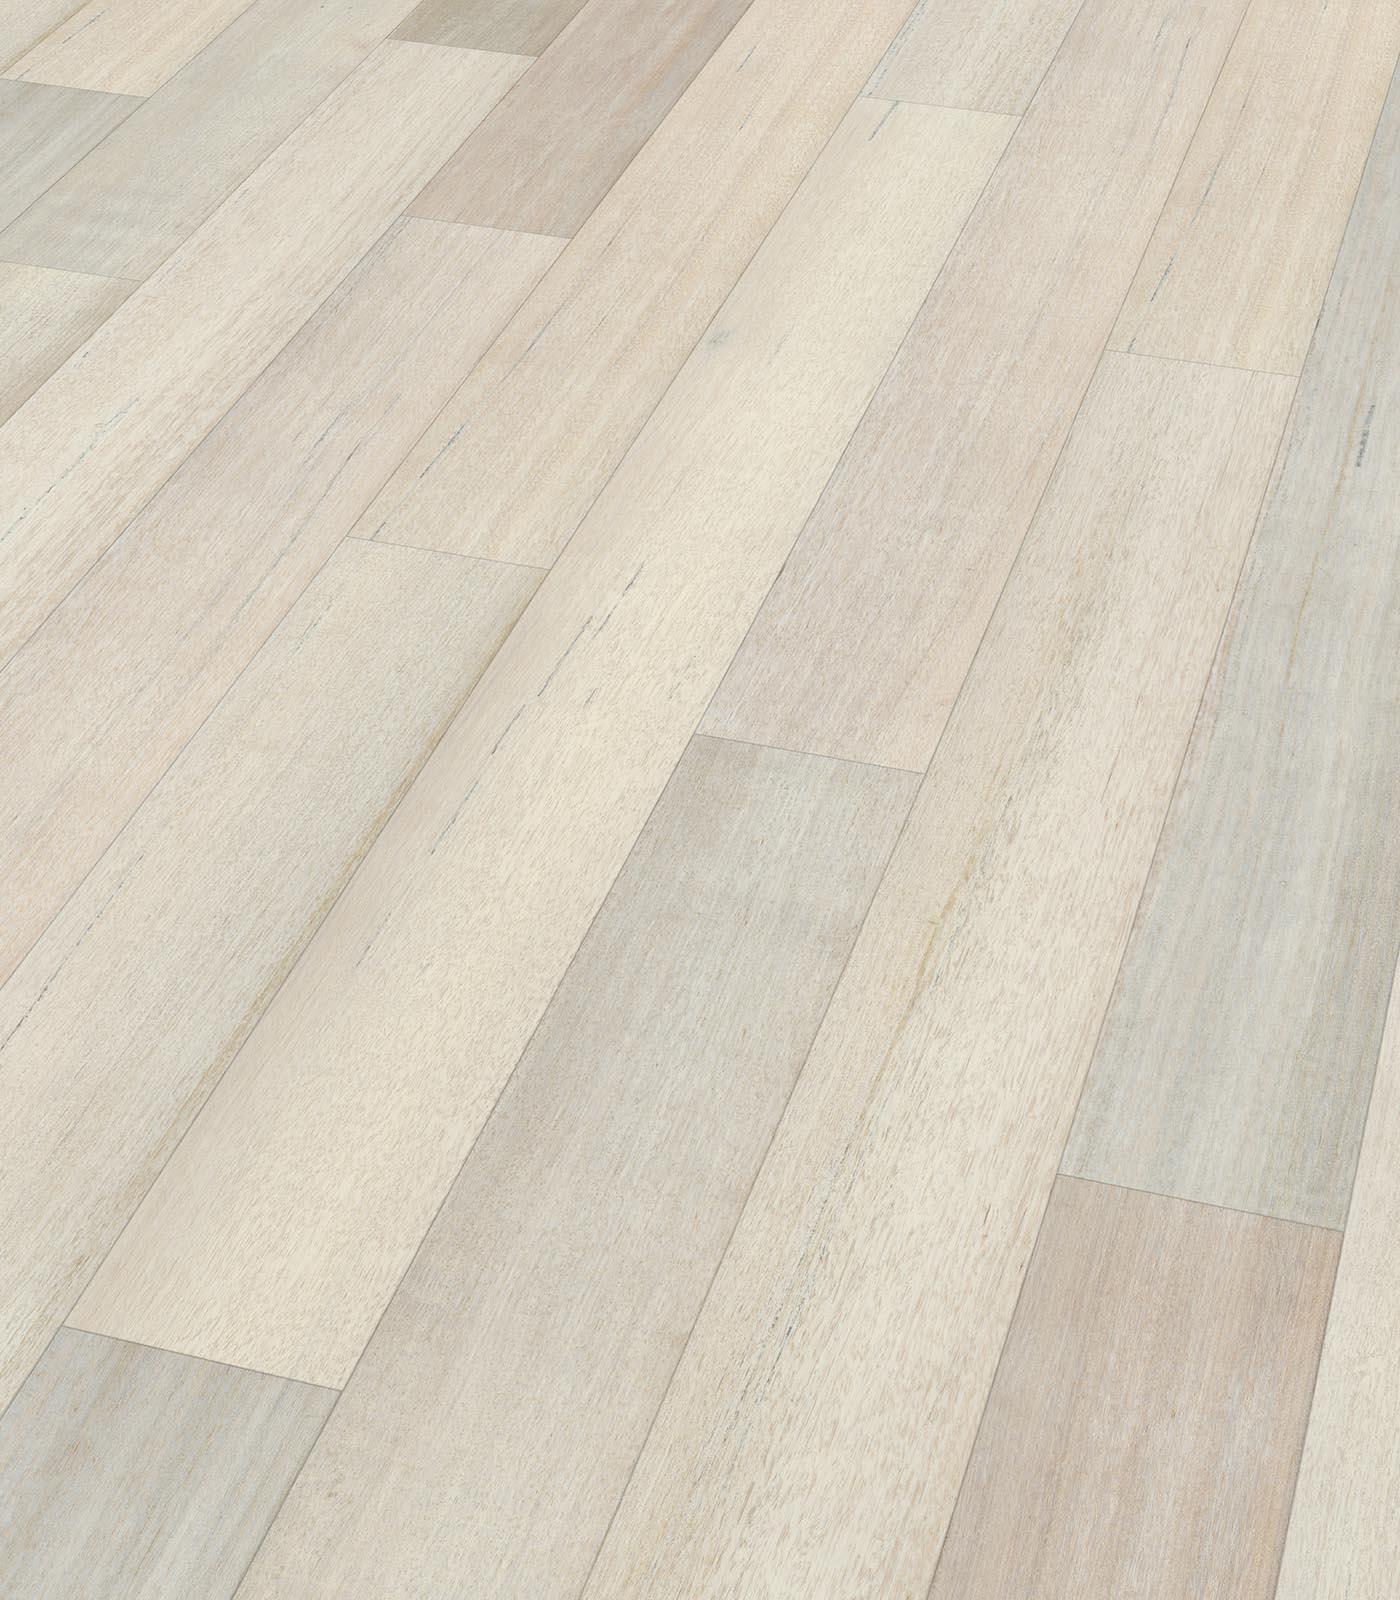 Geraldton-After Oak Collection-Tasmanian Oak Floors-angle